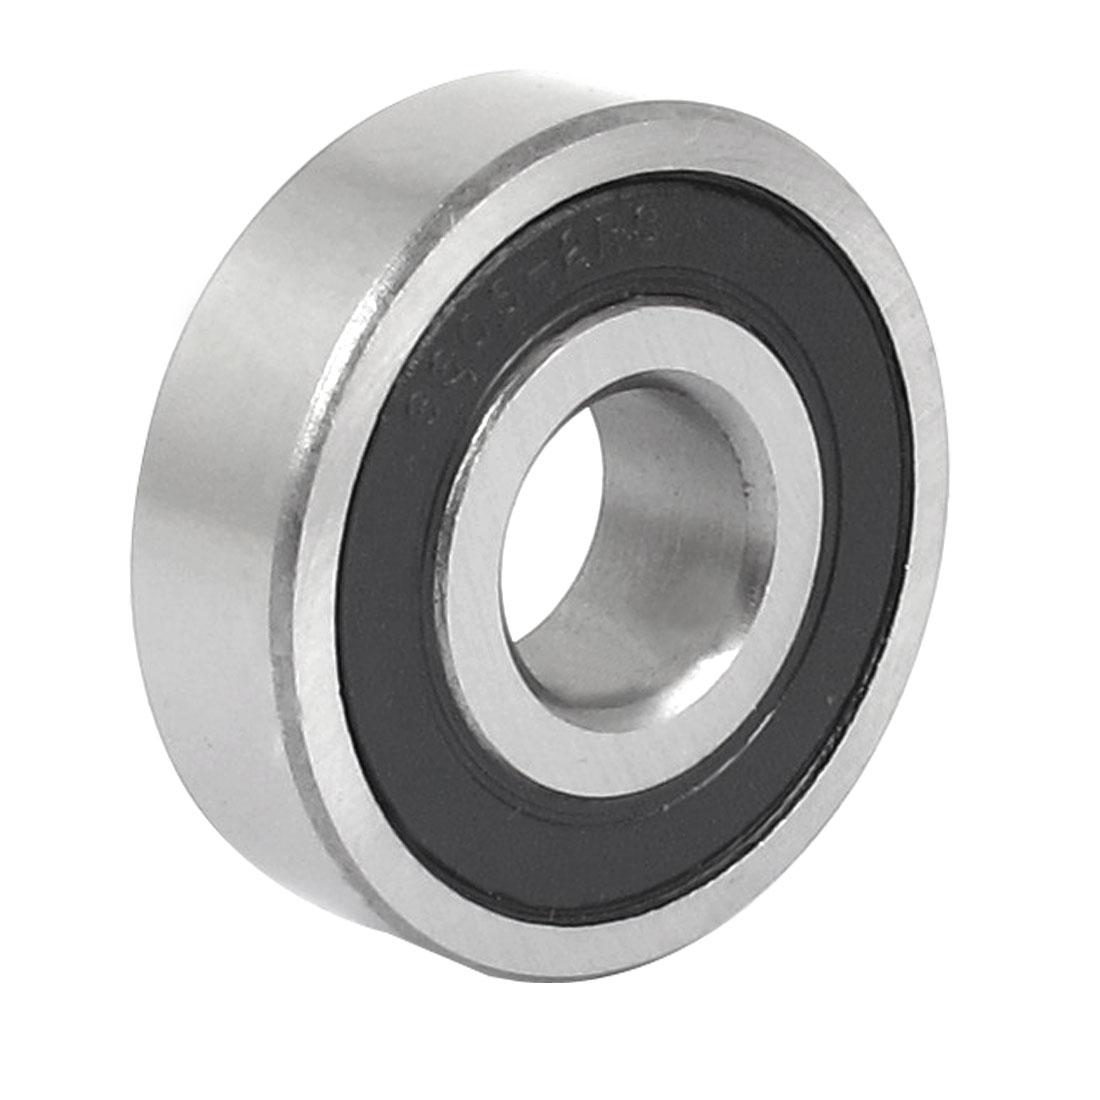 47mm x 17mm x 14mm 6303-2RS Sealing Rubber Groove Ball Wheel Bearings